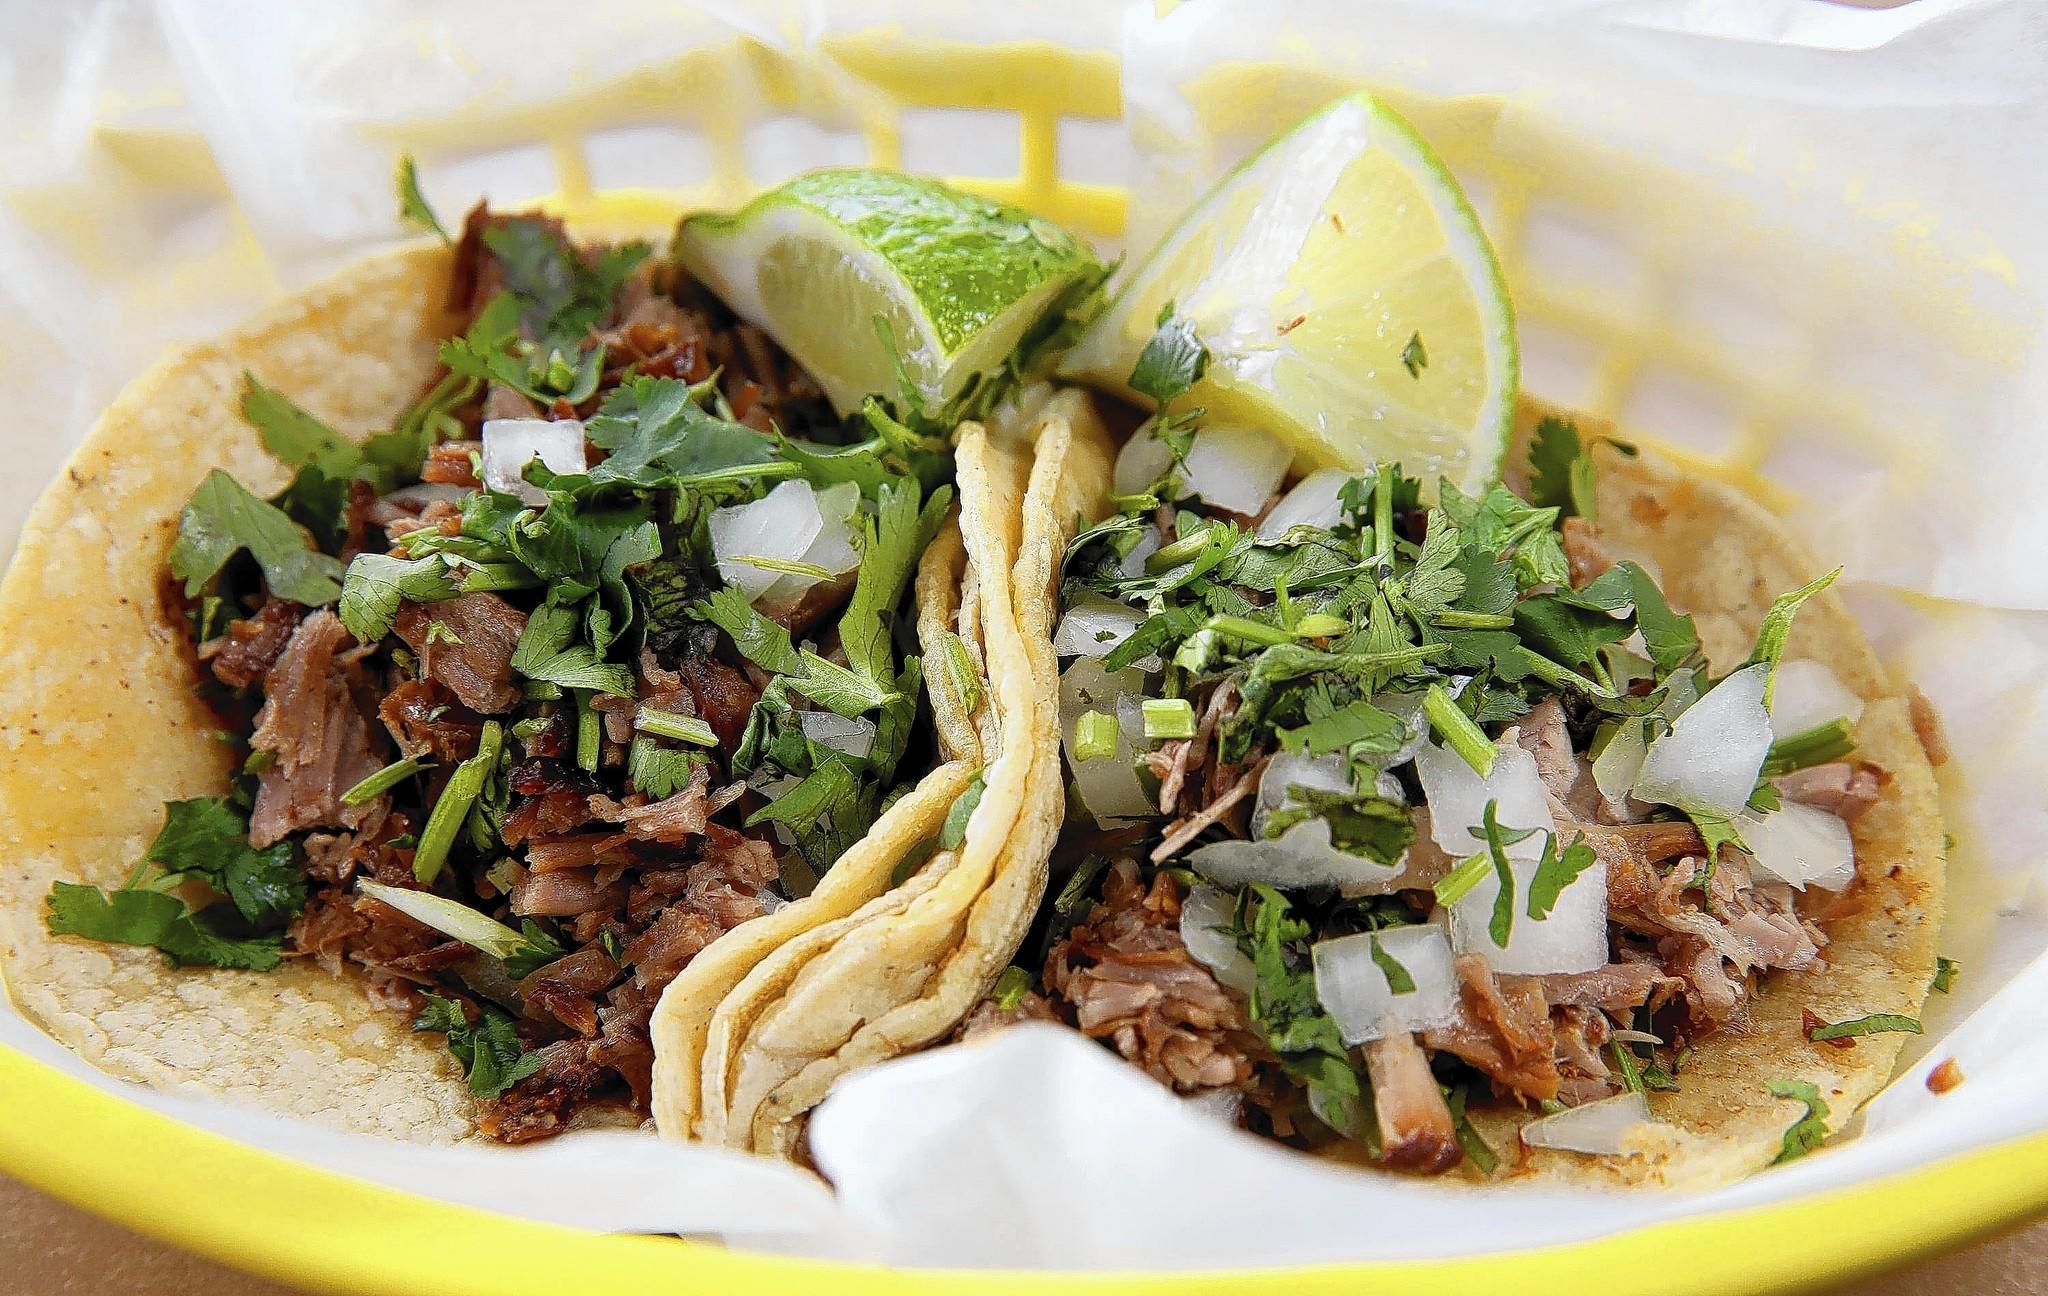 Platillo Típico - Tacos de Carnitas